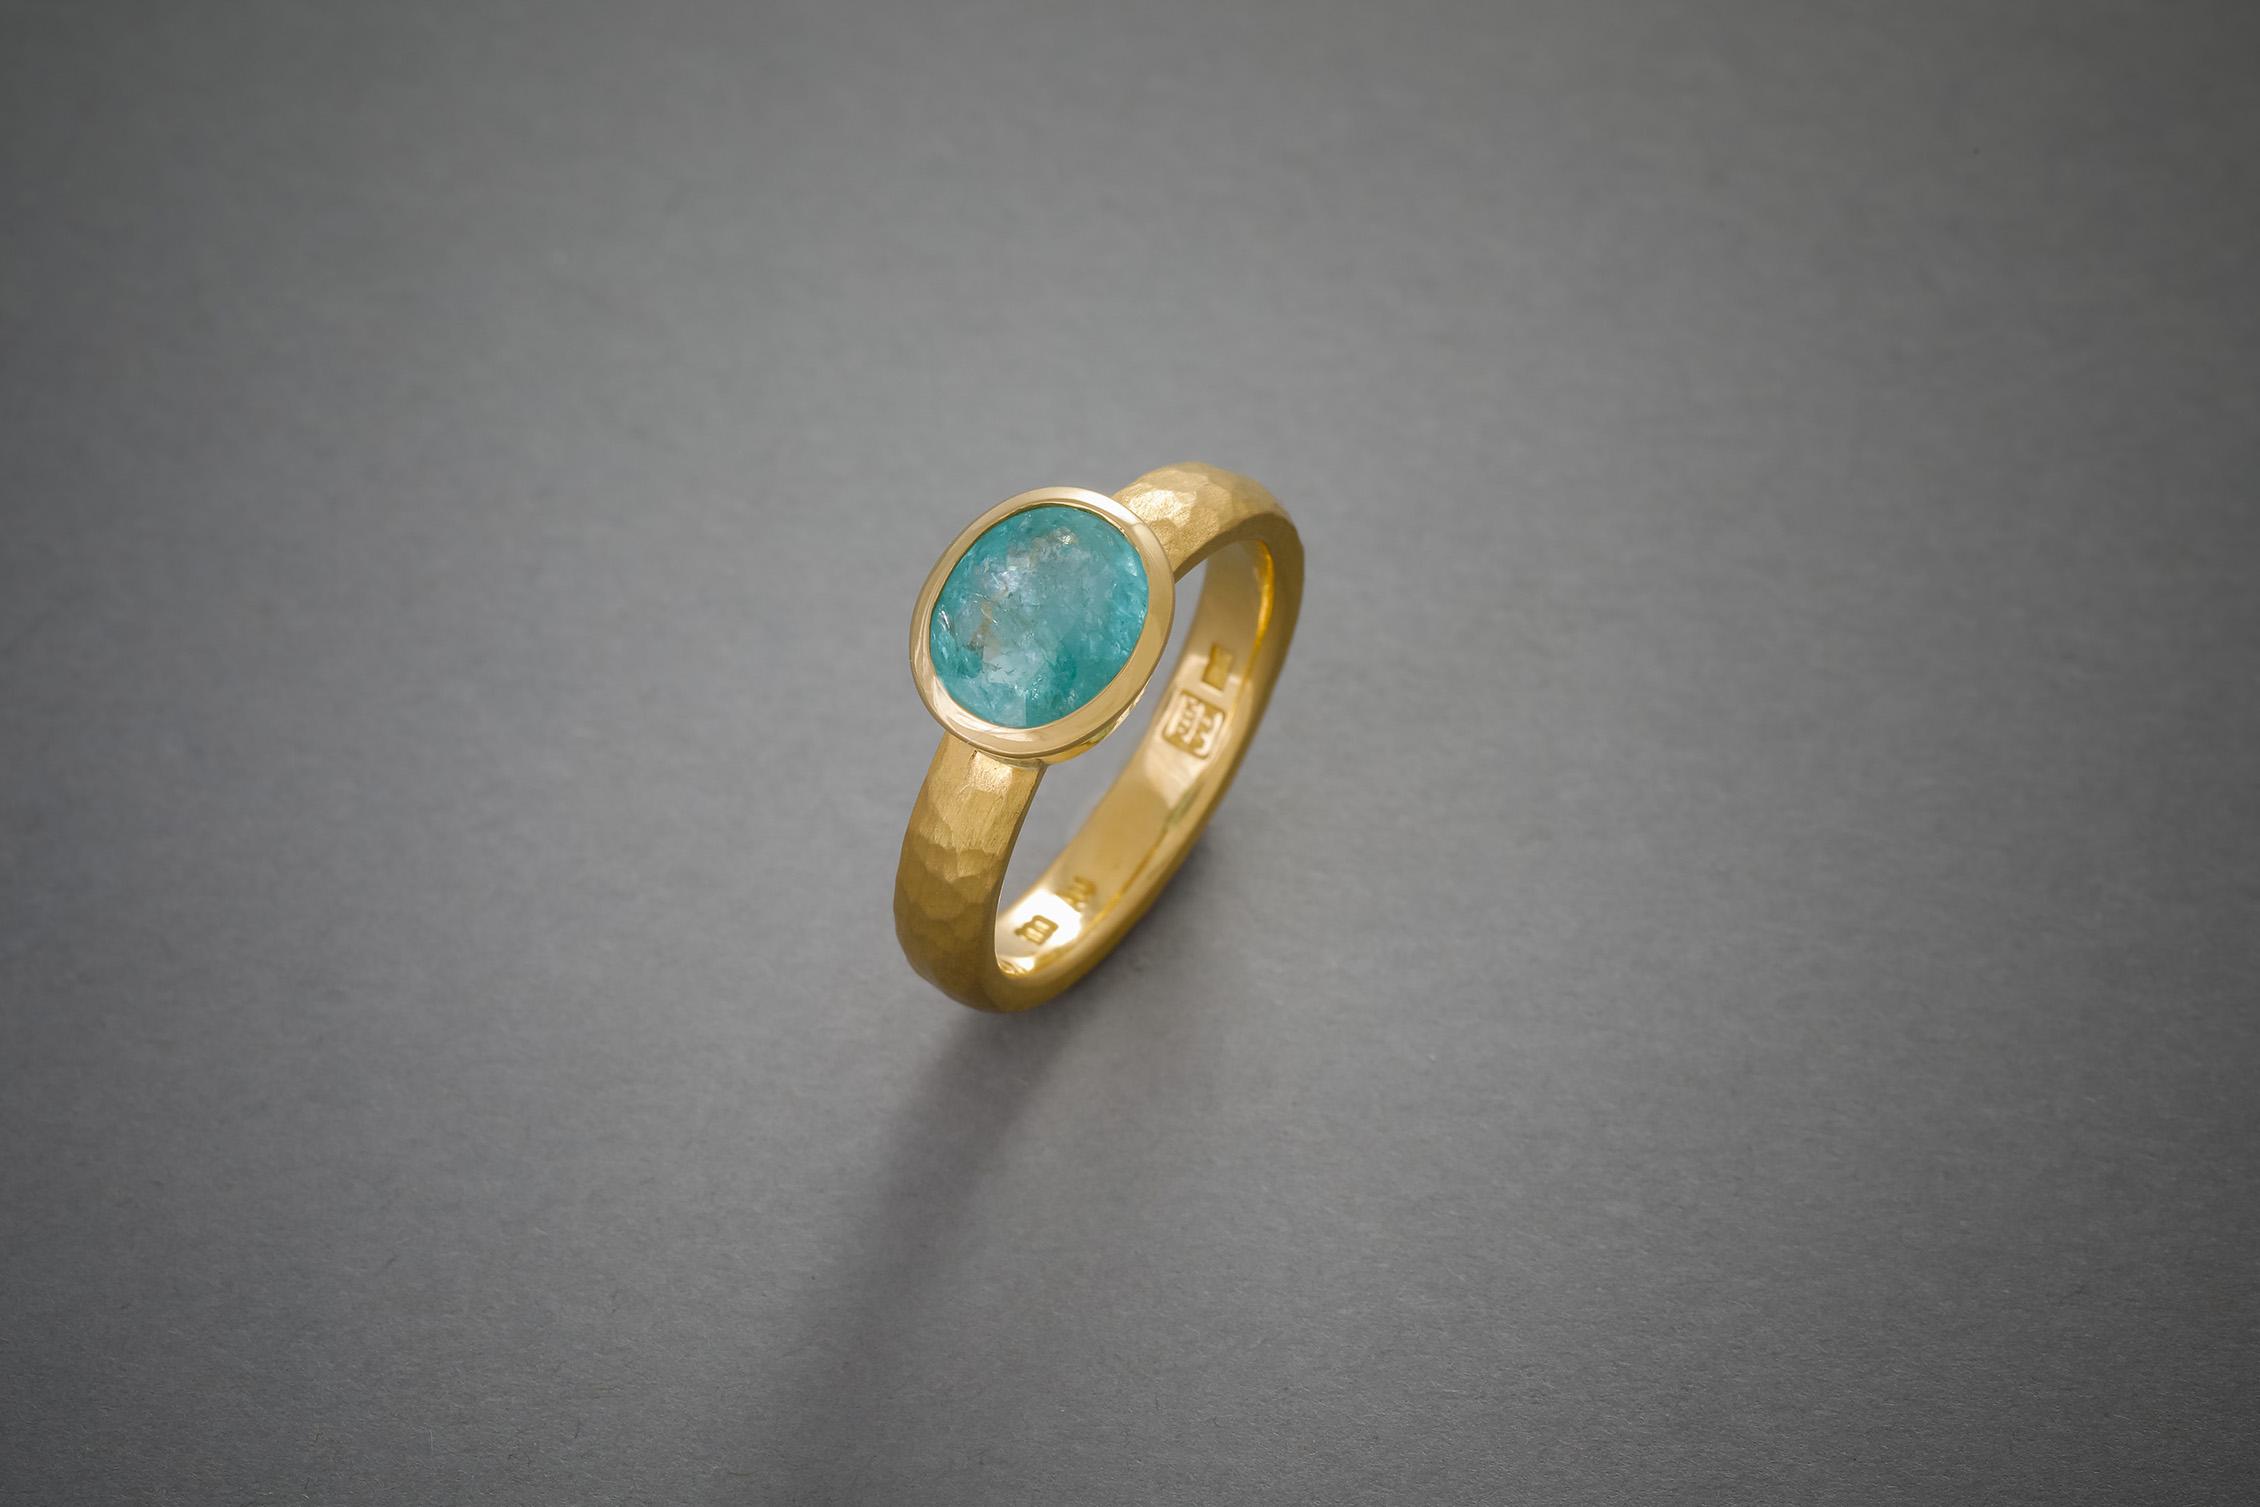 056 21kt Goldring, Paraiba Turmalin, Preis auf Anfrage